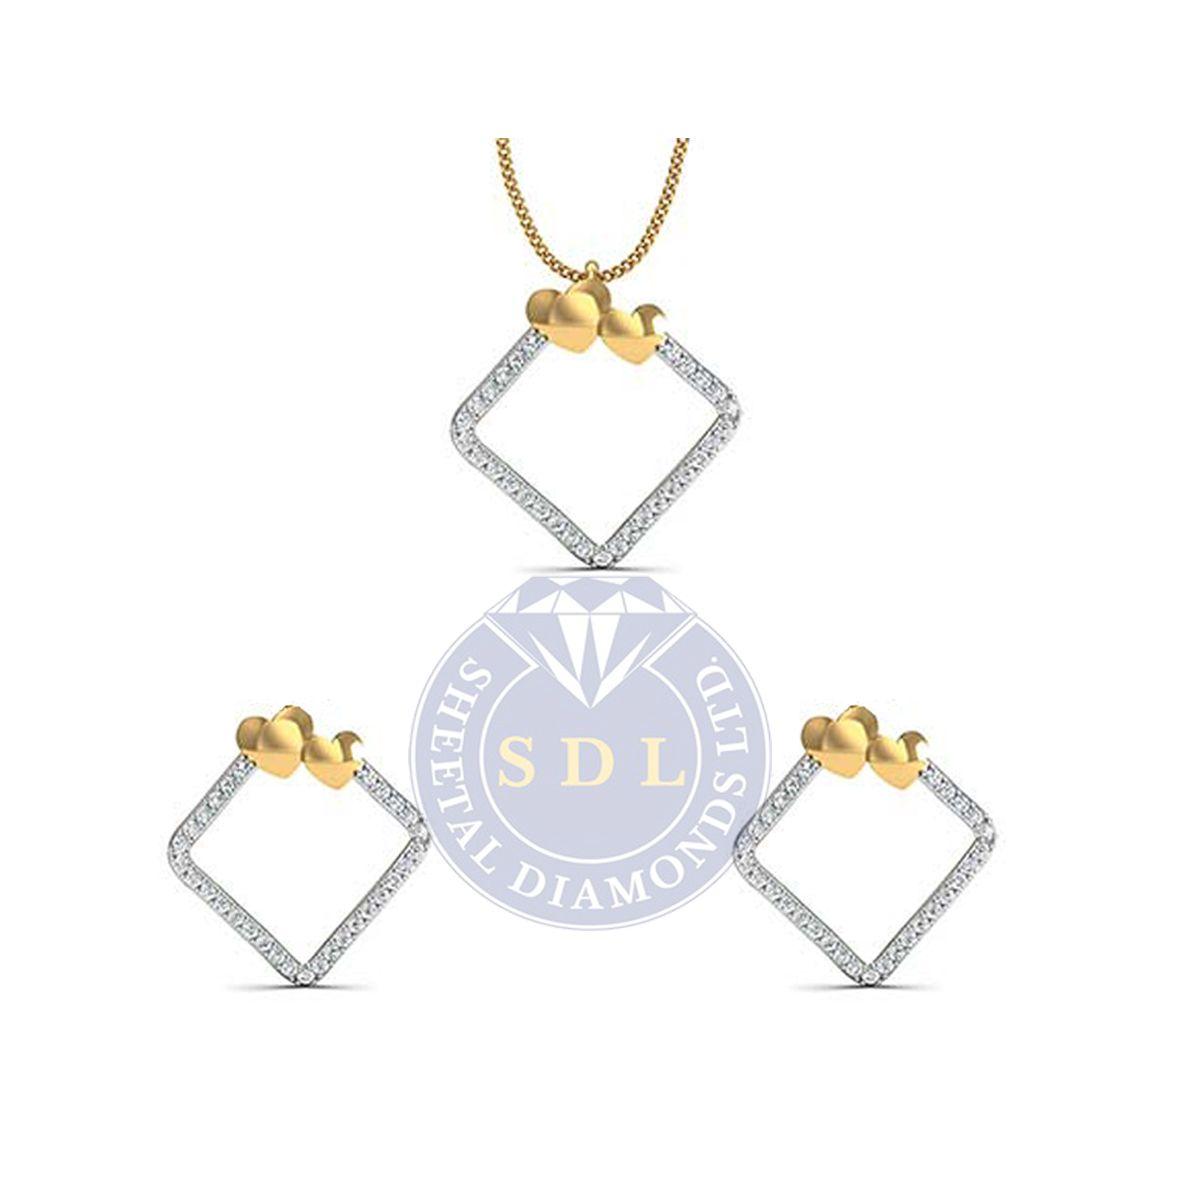 Sheetal diamonds has eternally beautiful diamond pendant sets for